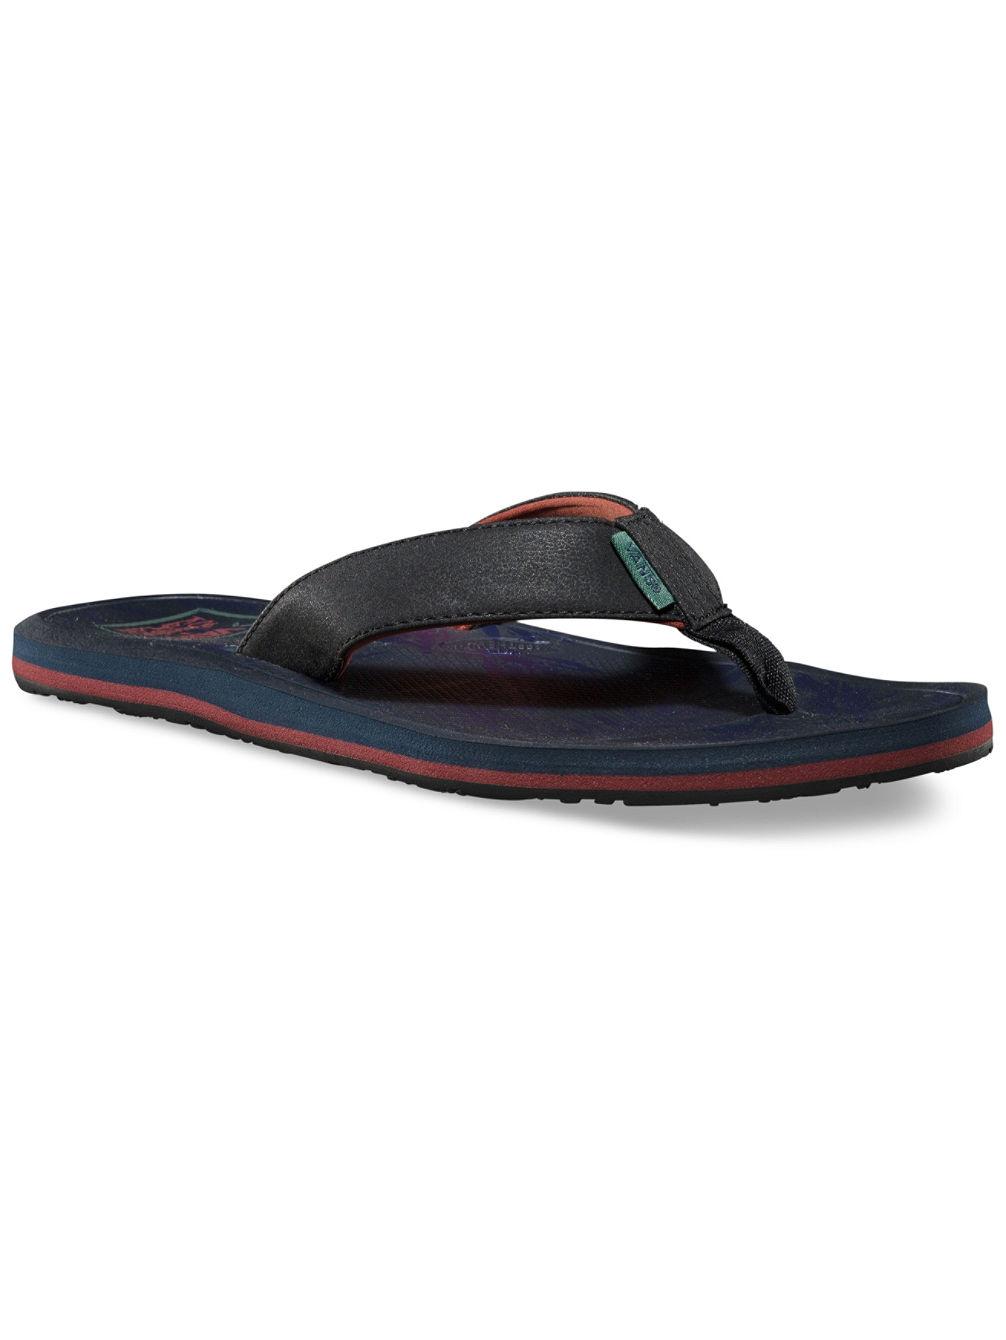 a2e948e27e Buy Vans Nexpa Synthetic Sandals online at Blue Tomato